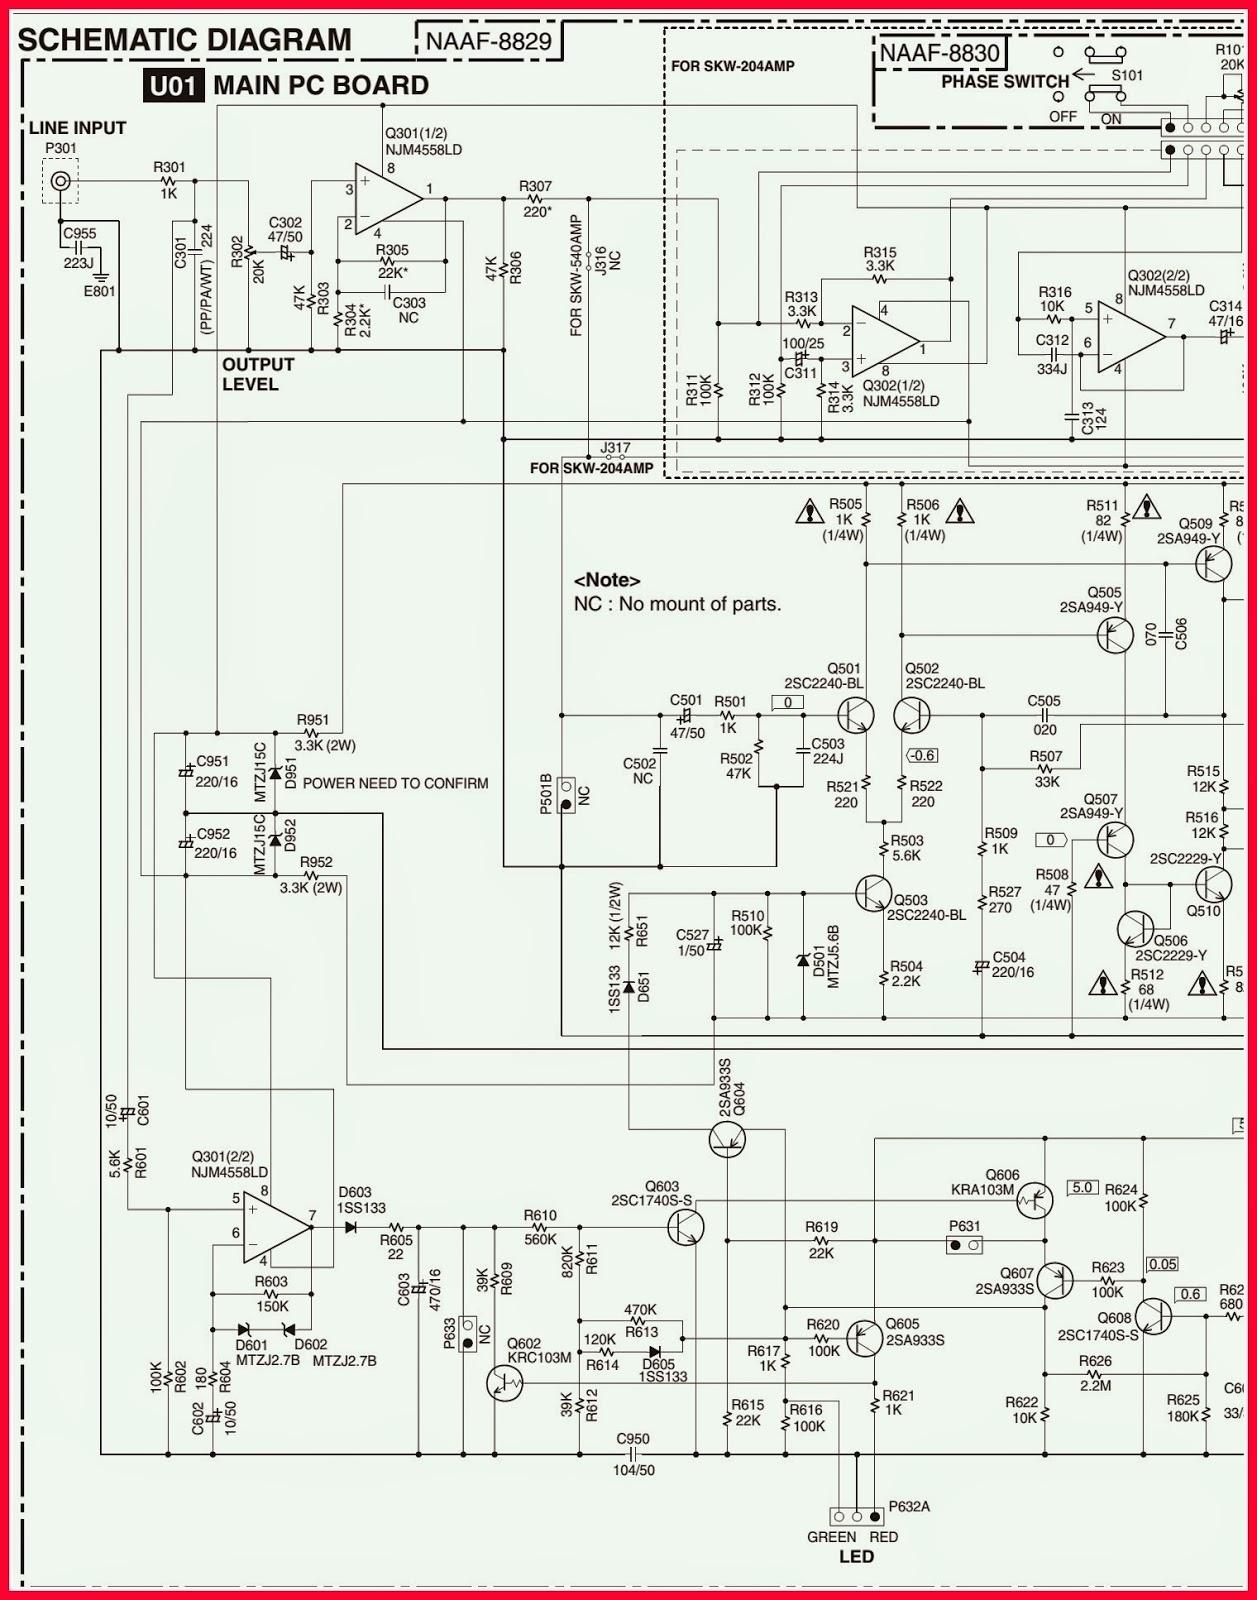 ELECTRONIC EQUIPMENT REPAIR CENTRE : ONKYO SKW-204(B)/(S